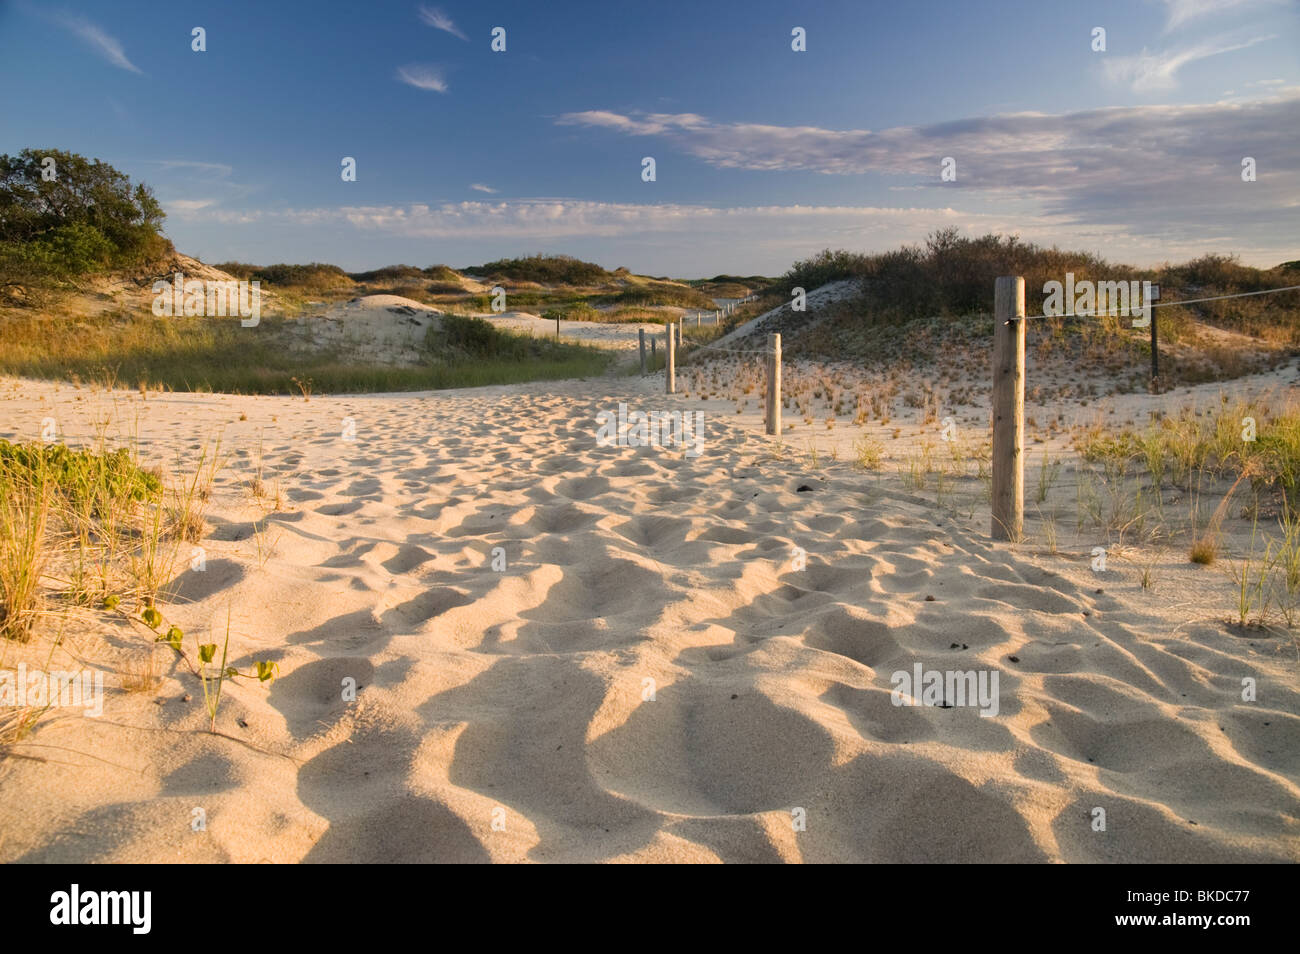 Sand Dunes at Cape Cod National Seashore, Provincetown, Massachusetts - Stock Image